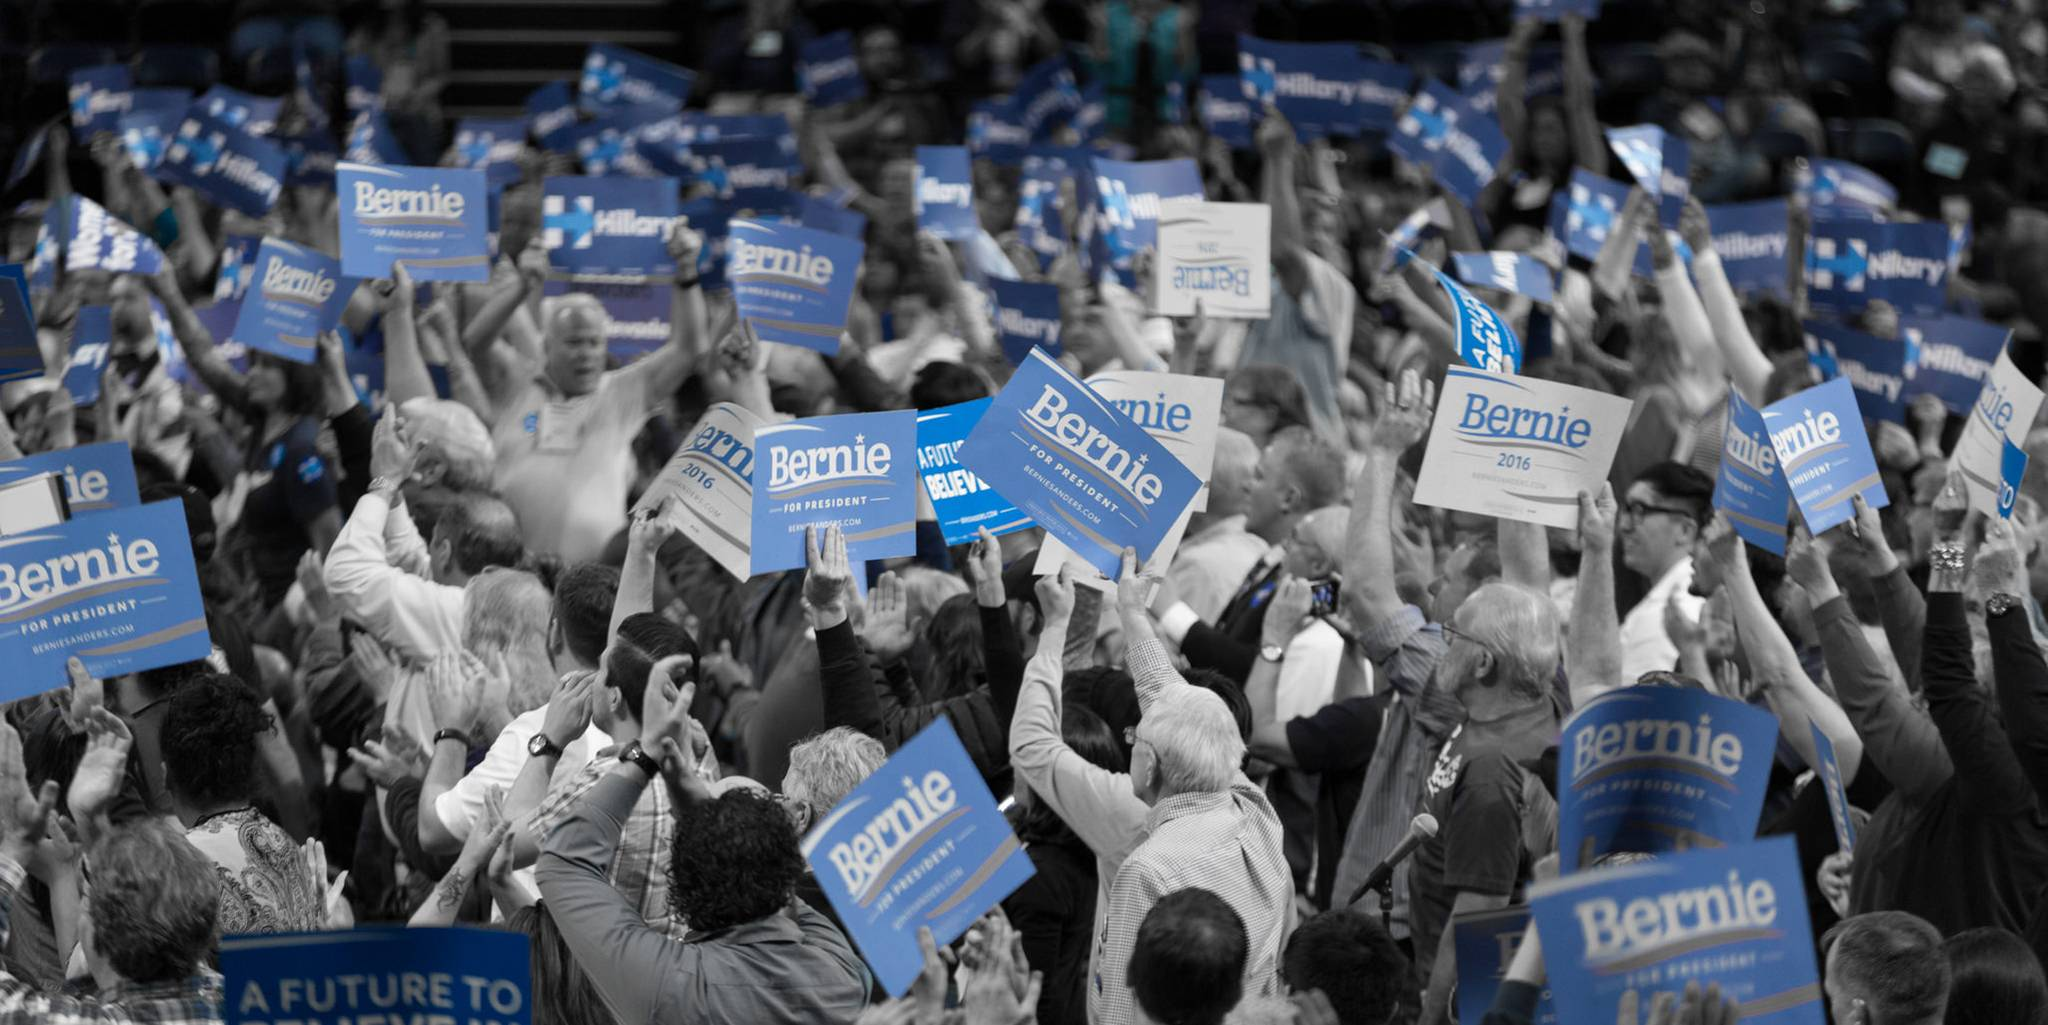 Bernie signs